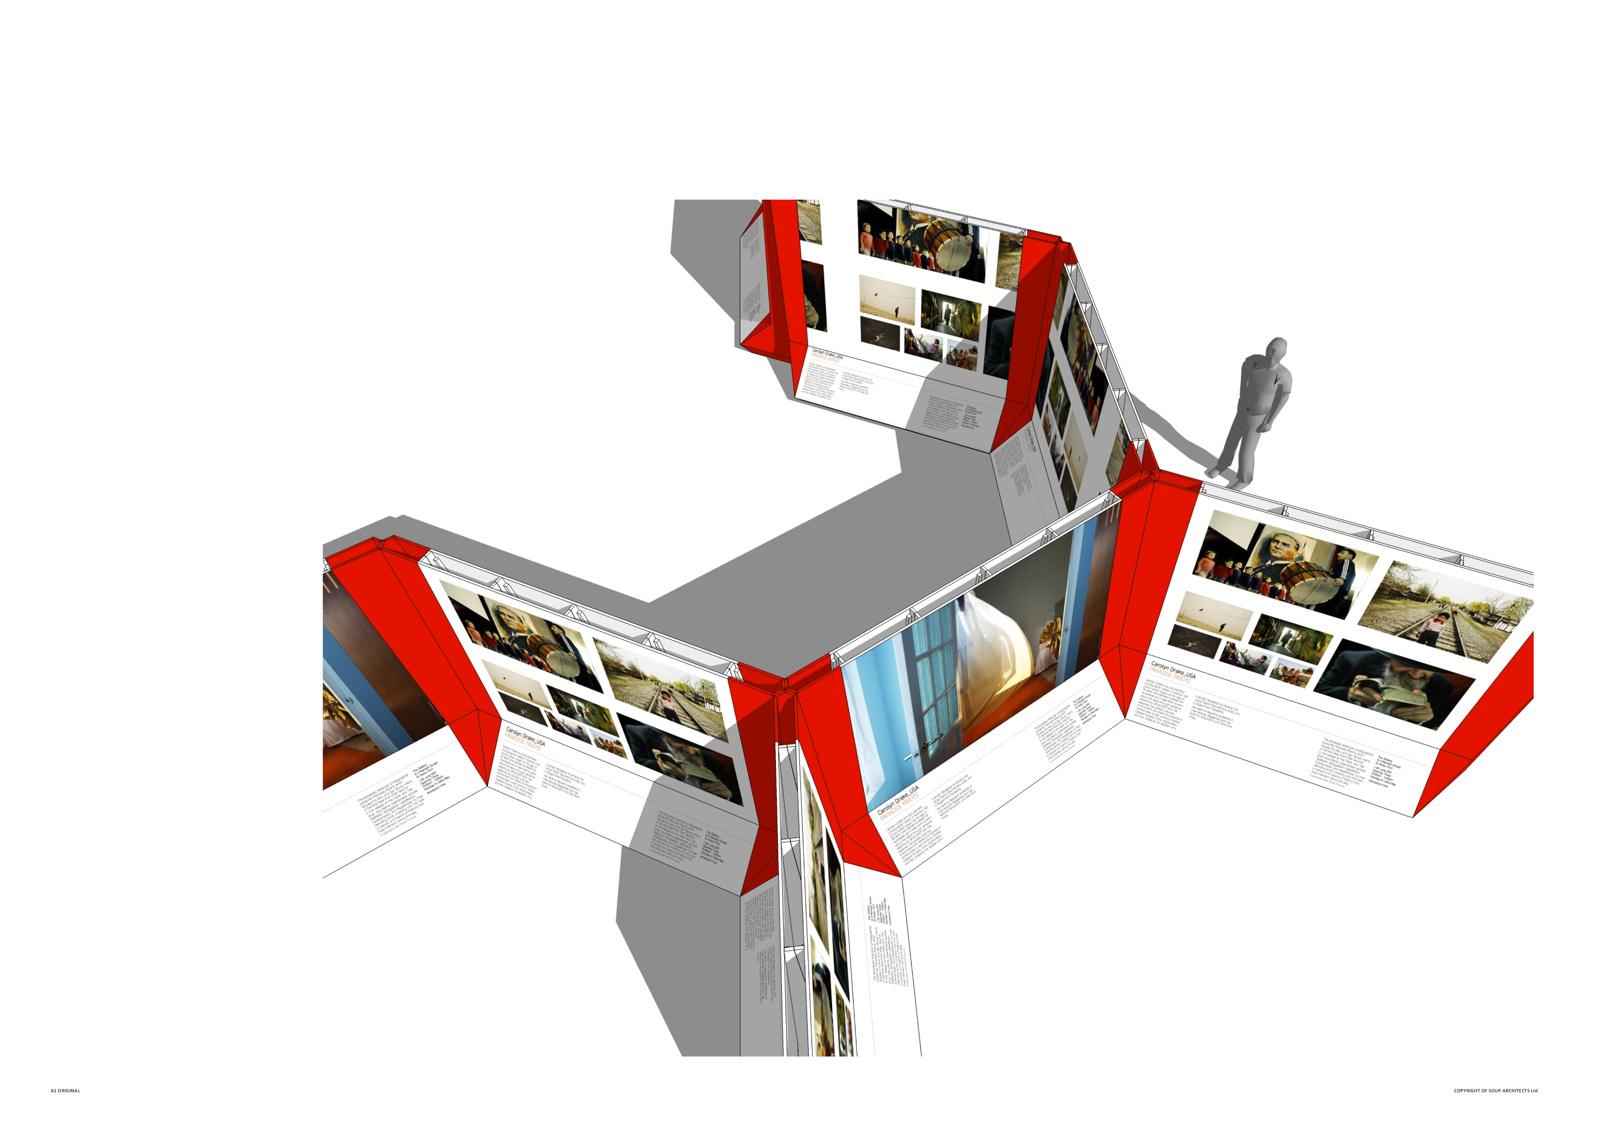 d950c4c9633b94d9-GPF_ExhibitionBoard_WorkingDrawings04.jpg